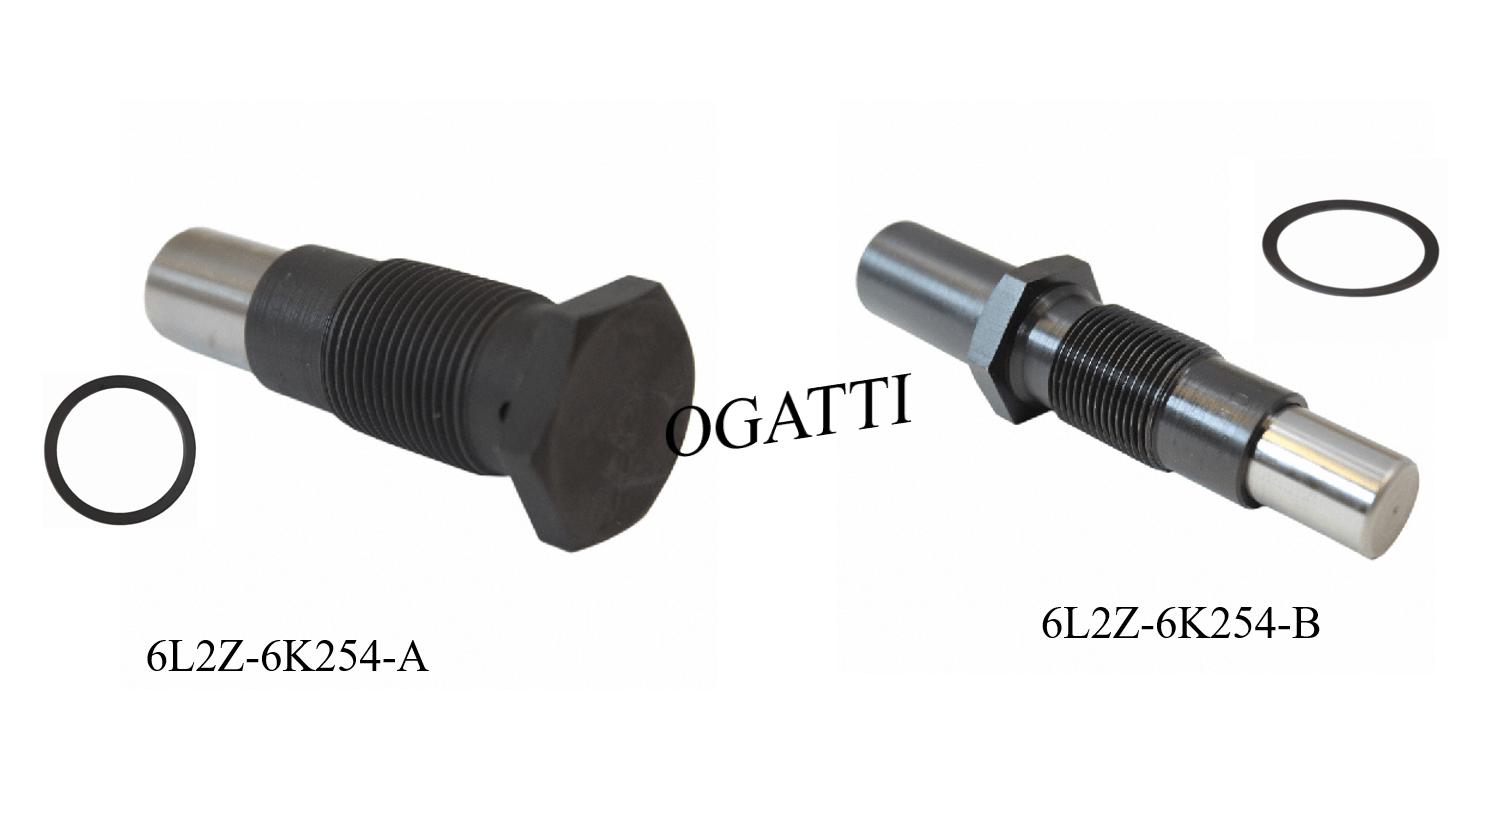 BRAND NEW OEM TENSIONER AND SHIM CASSETTE KIT RH-LH 4.0L, 2 PIECES ENGINE REPAIR KIT (OG-60-4.0L-2-2)